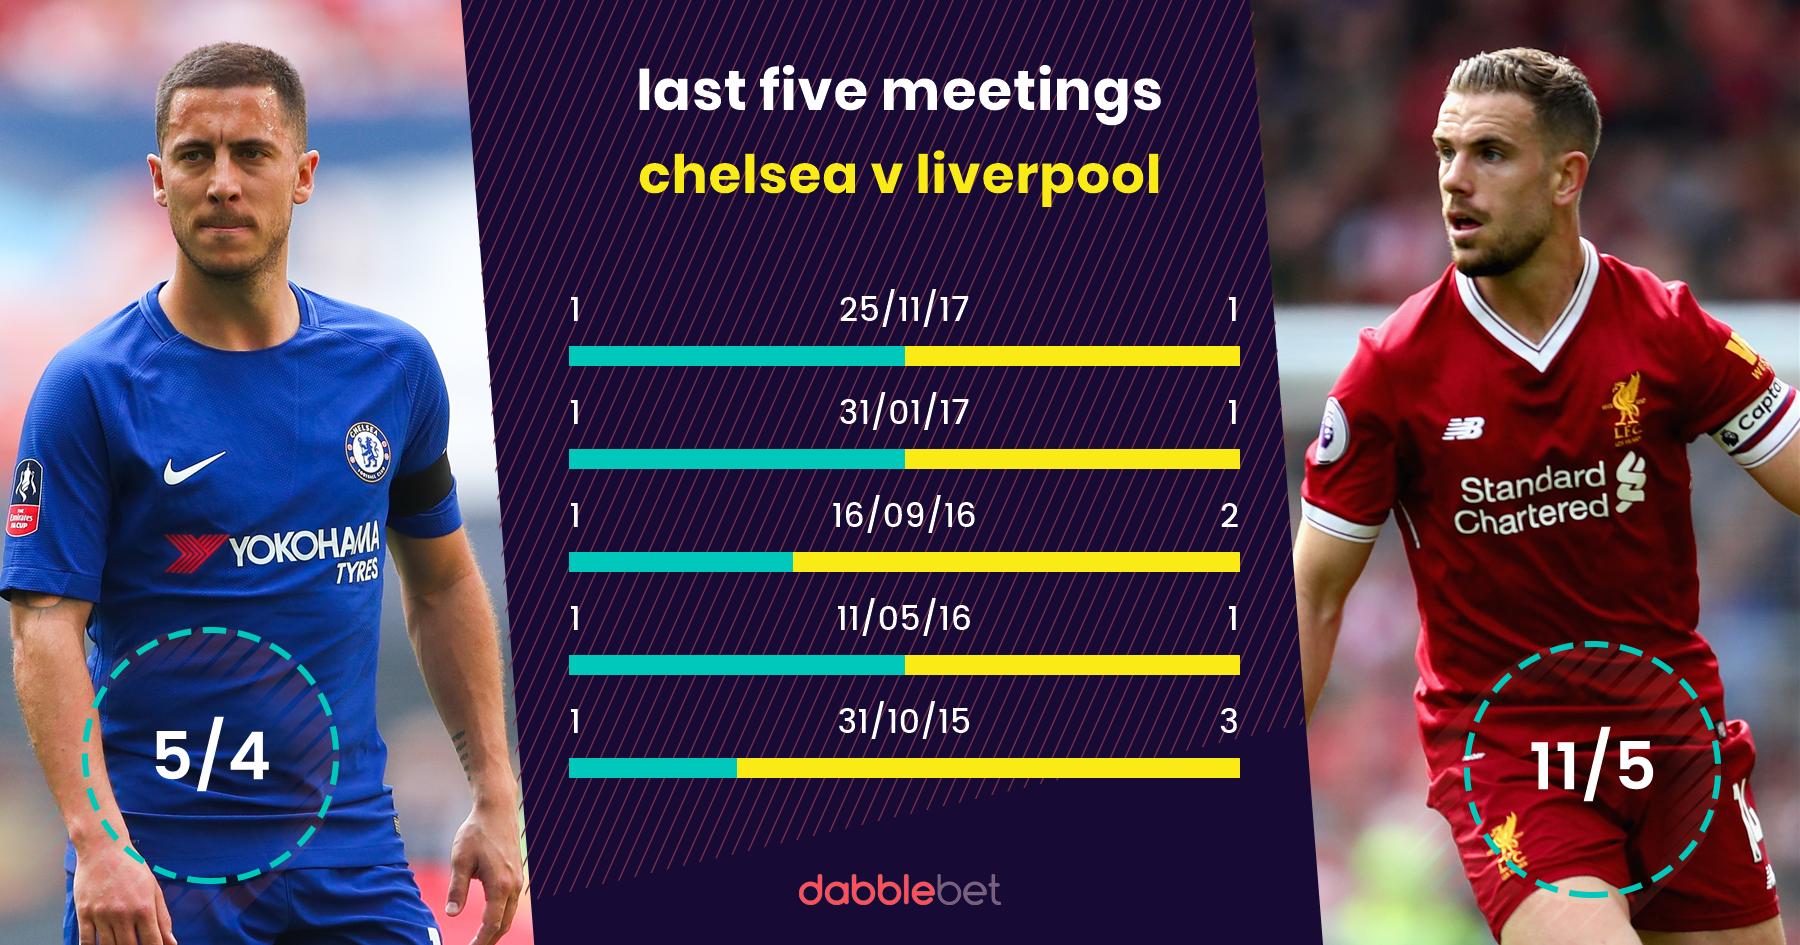 Chelsea Liverpool last five graphic